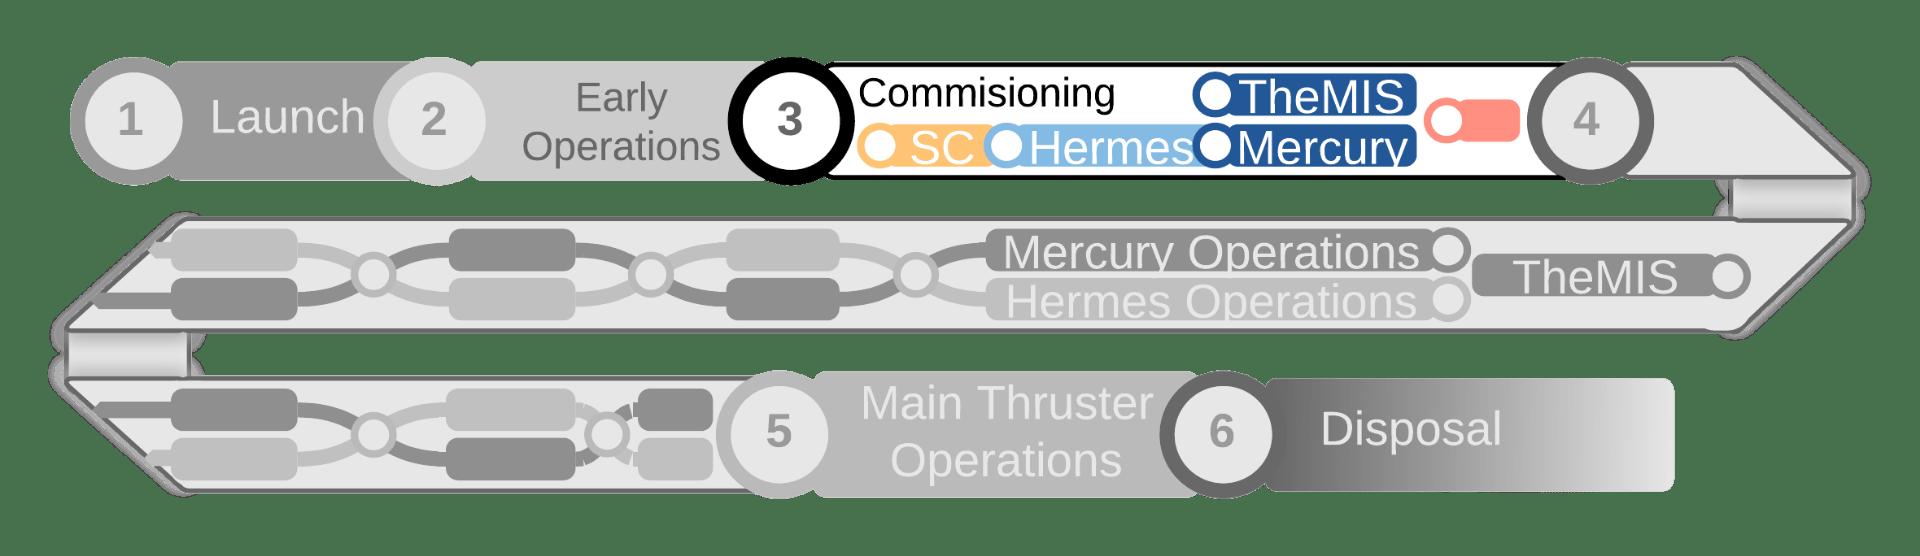 The SpIRIT Operational Timeline